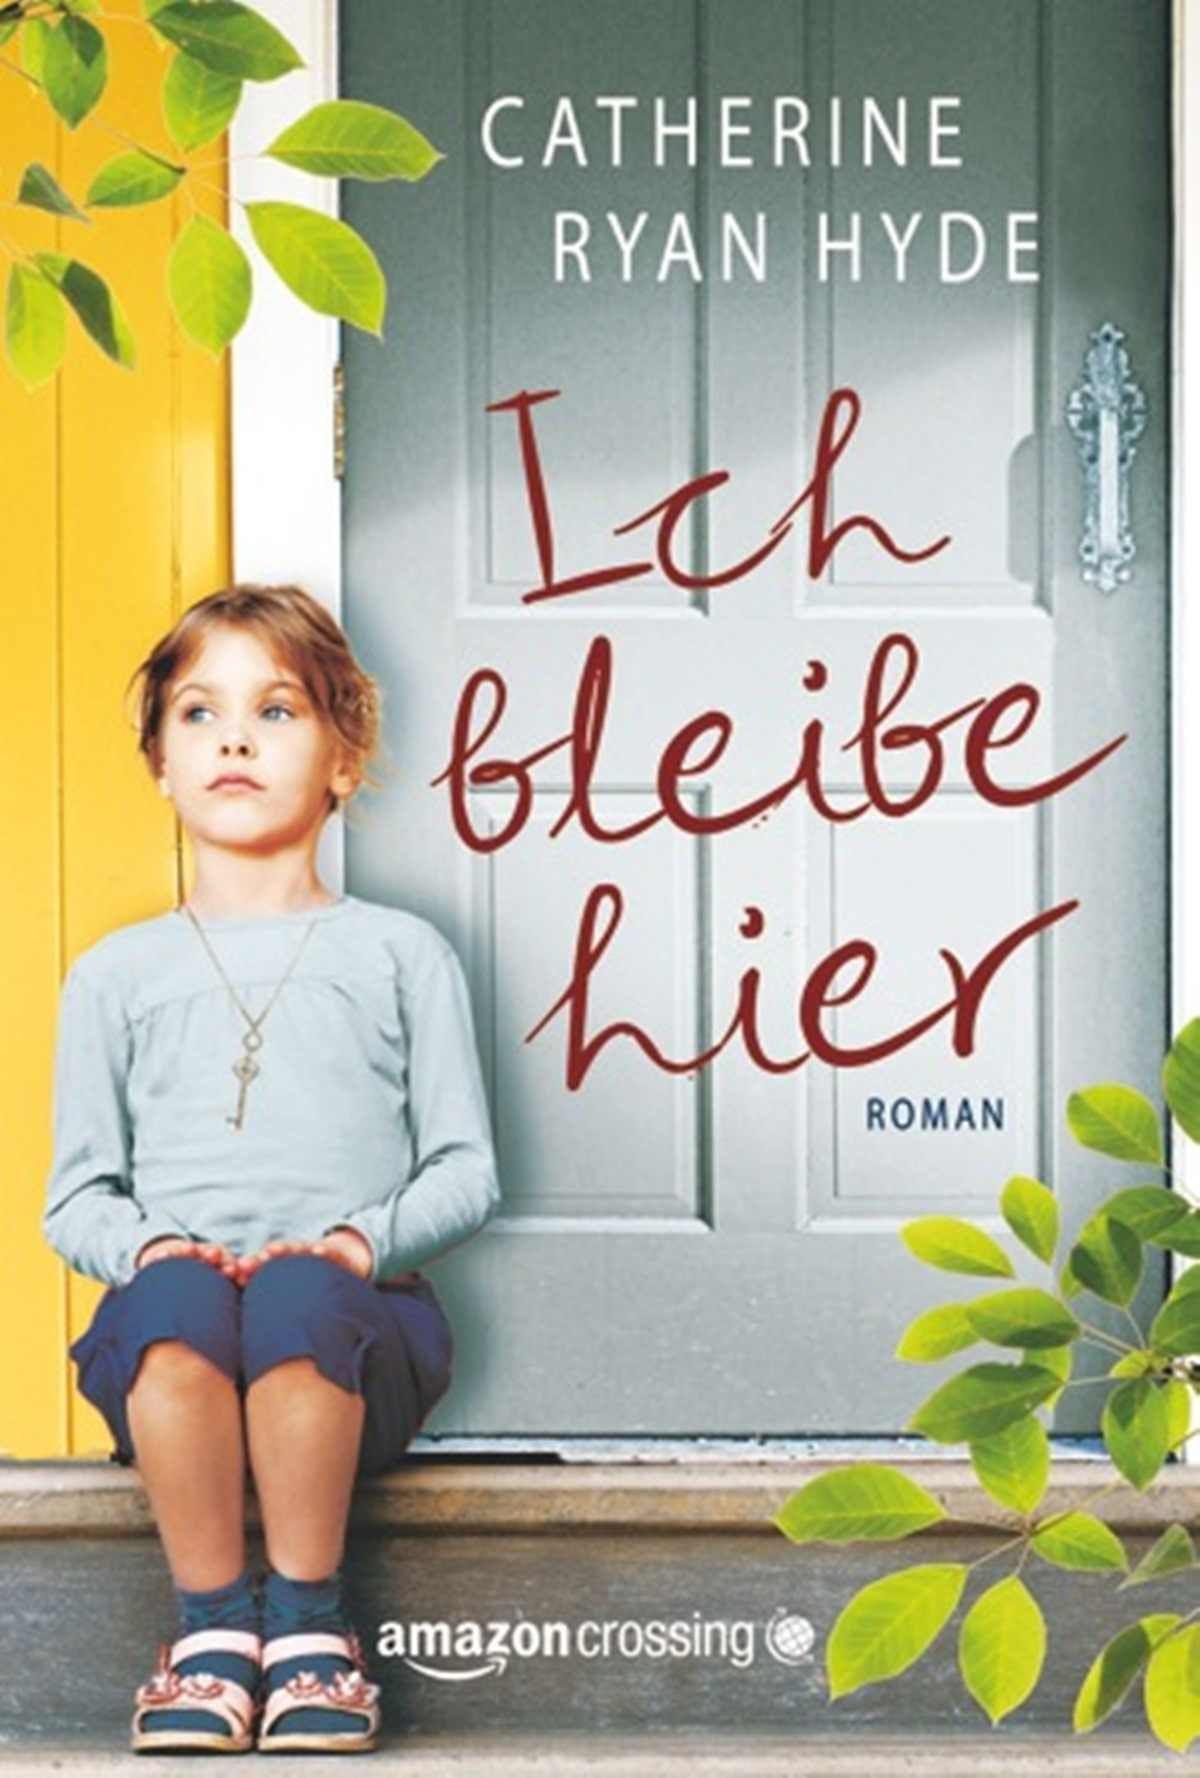 Amazon.com: Ich bleibe hier (German Edition) eBook: Catherine Ryan Hyde, Marion Plath: Kindle Store